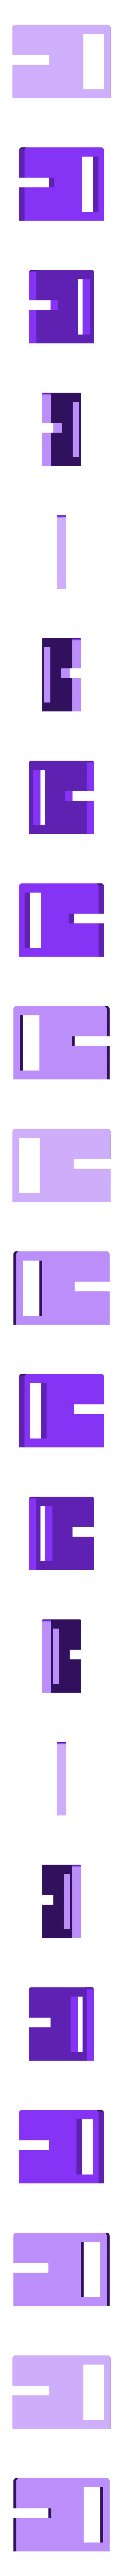 Body2.stl Download STL file Dock for all • Design to 3D print, n256